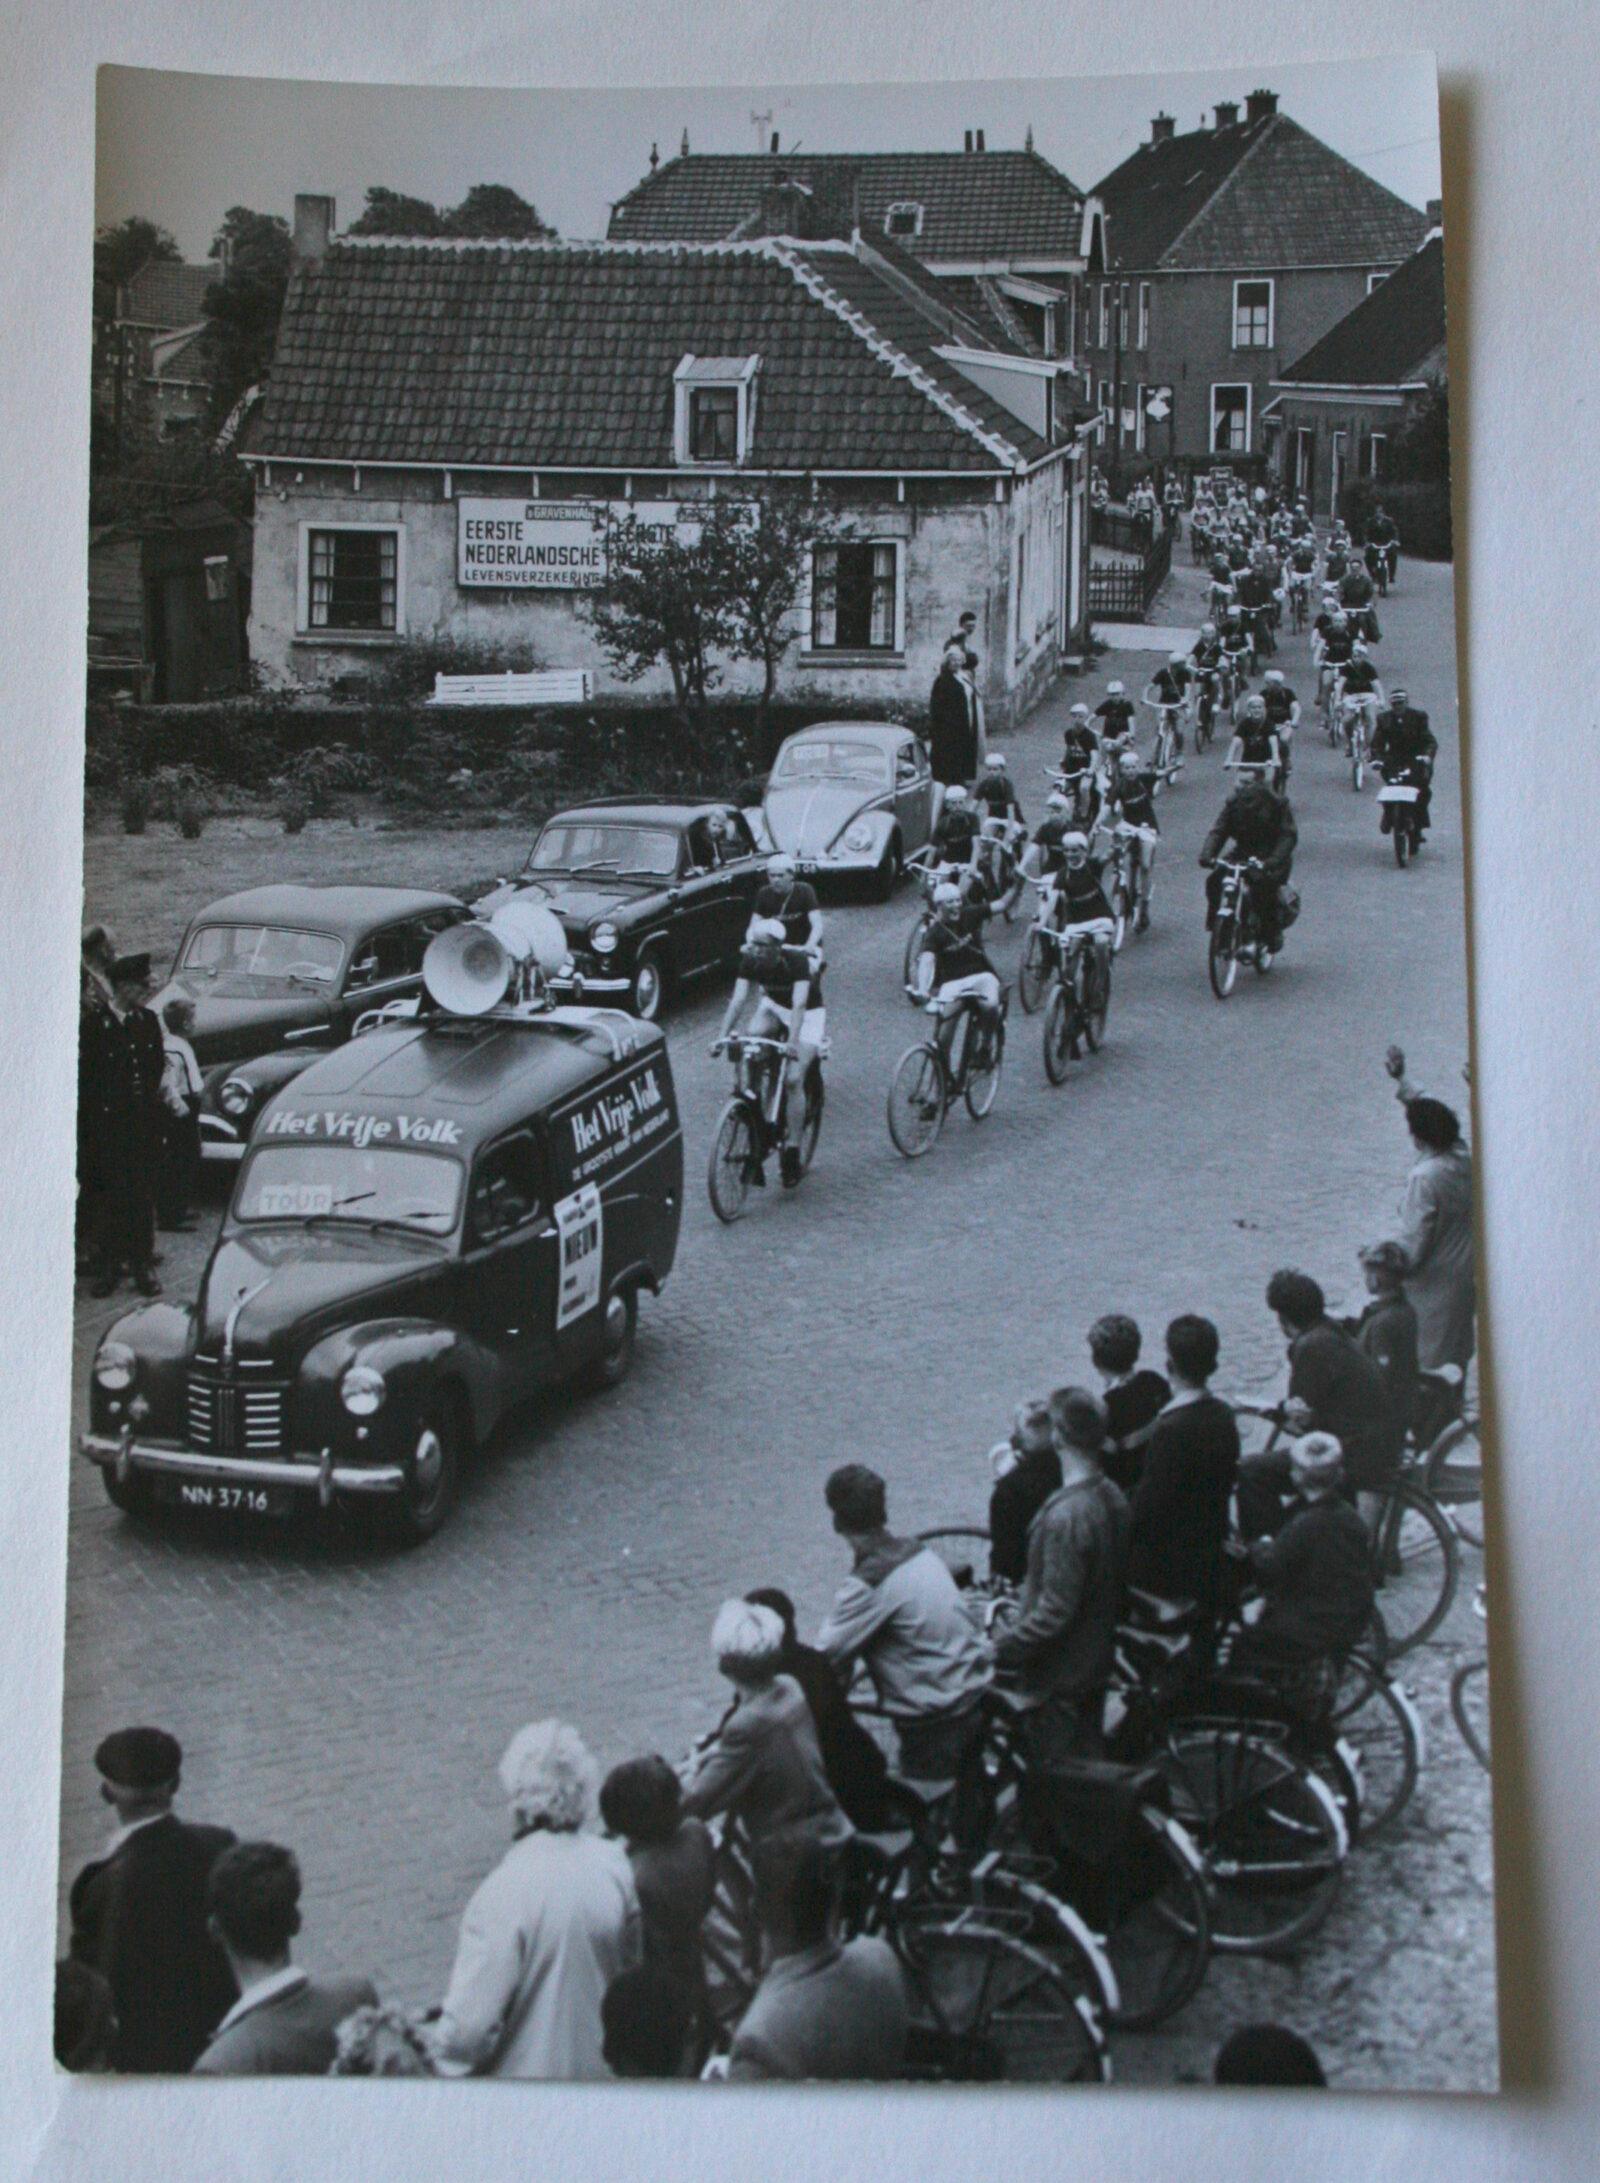 Hanshollander Vrijevolk Fietstour